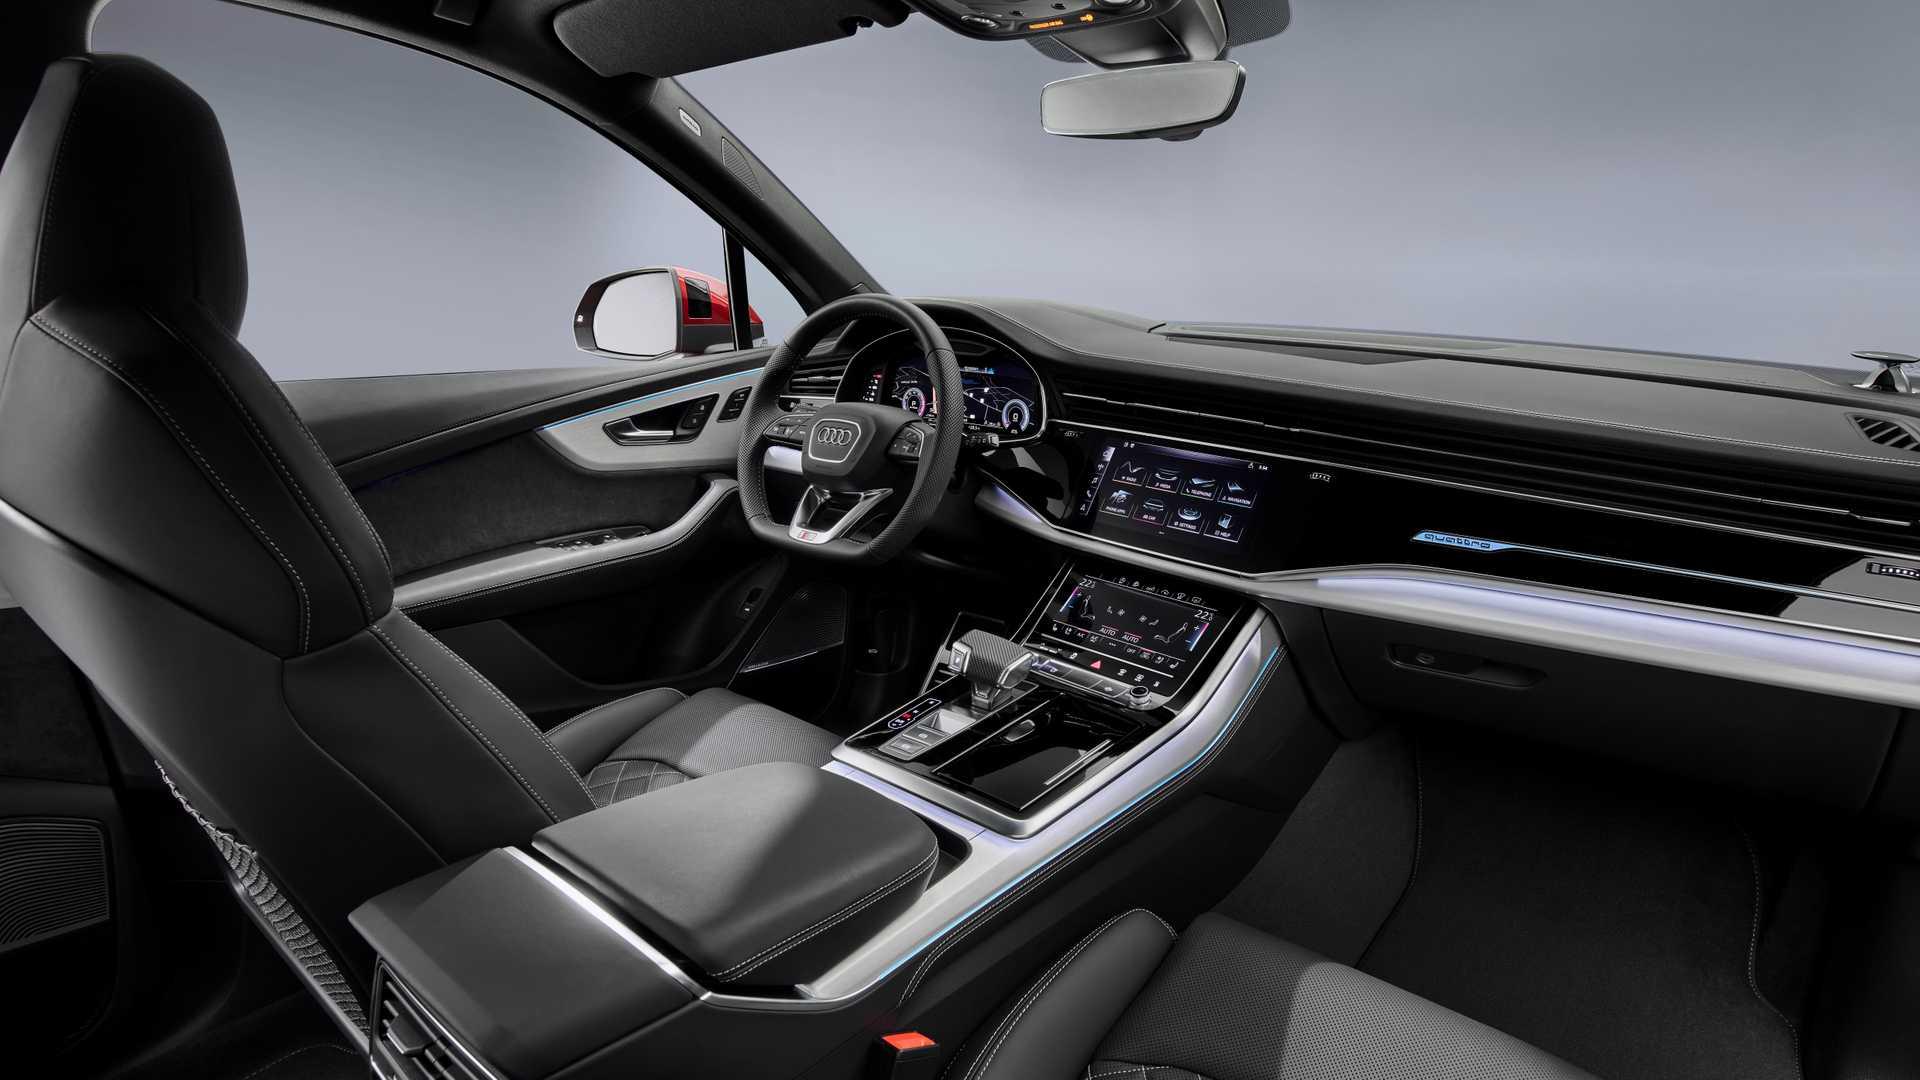 22 New Audi Google Earth 2020 Ratings for Audi Google Earth 2020